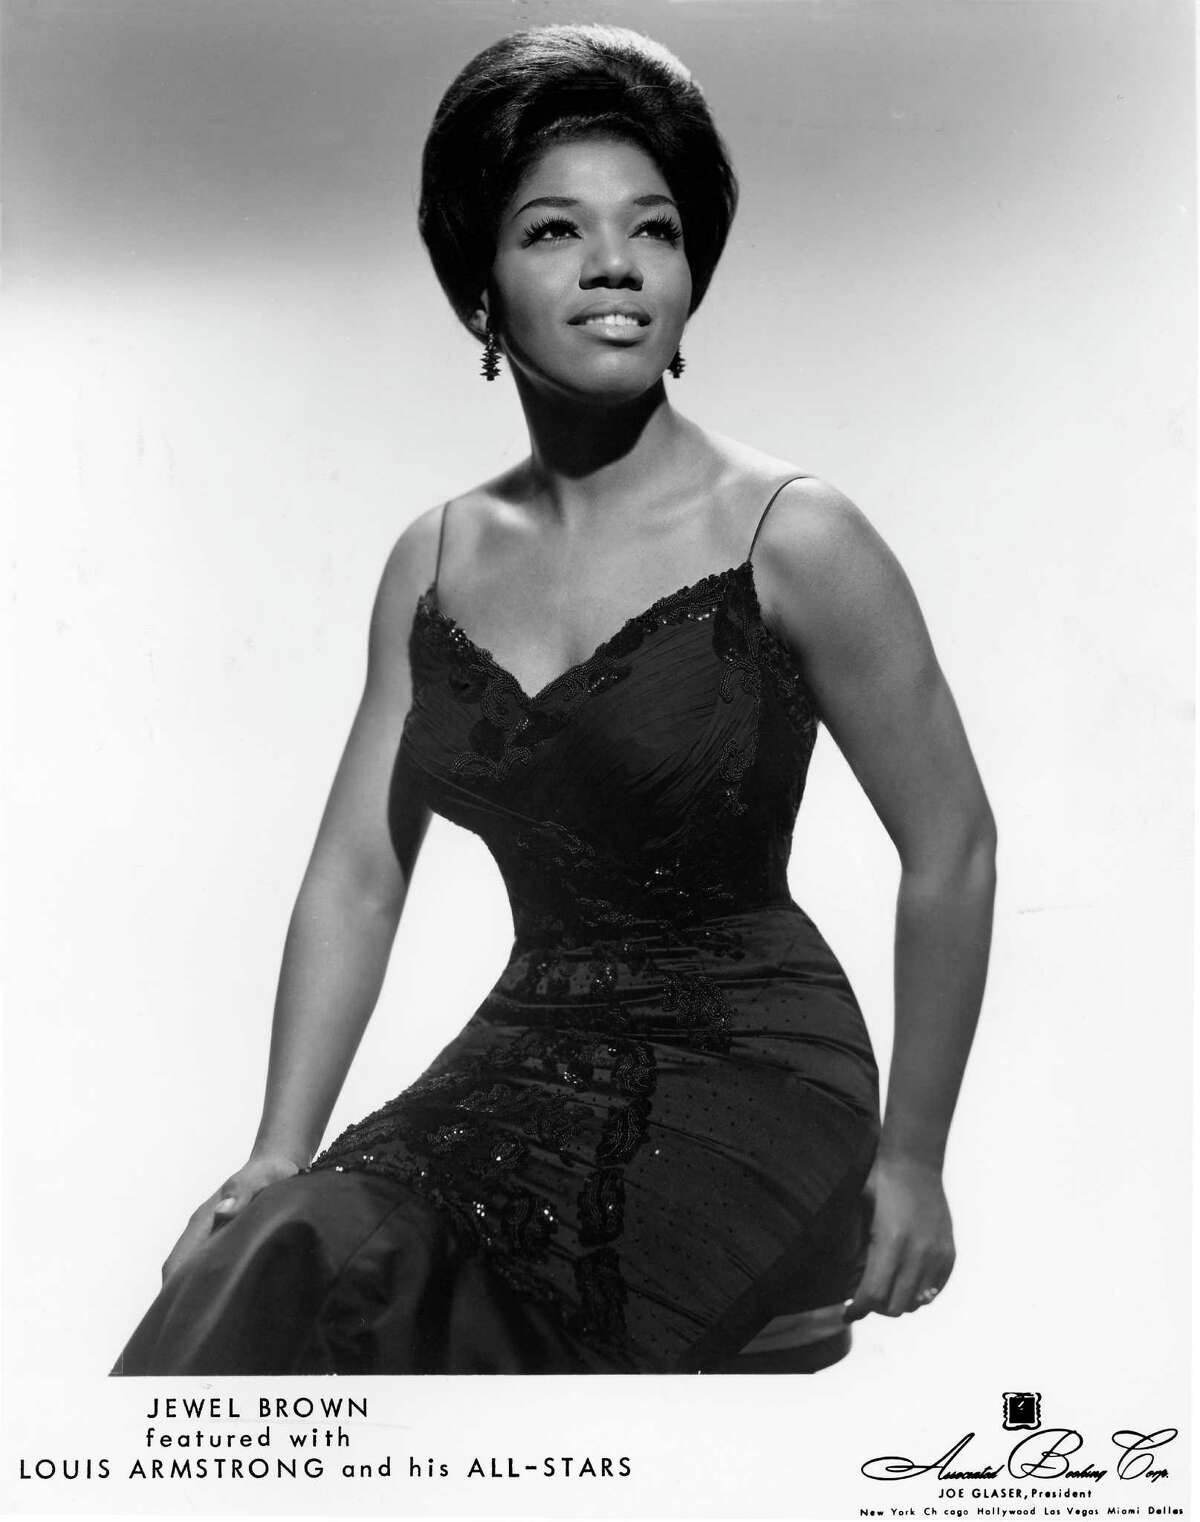 1966 - singer Jewel Brown